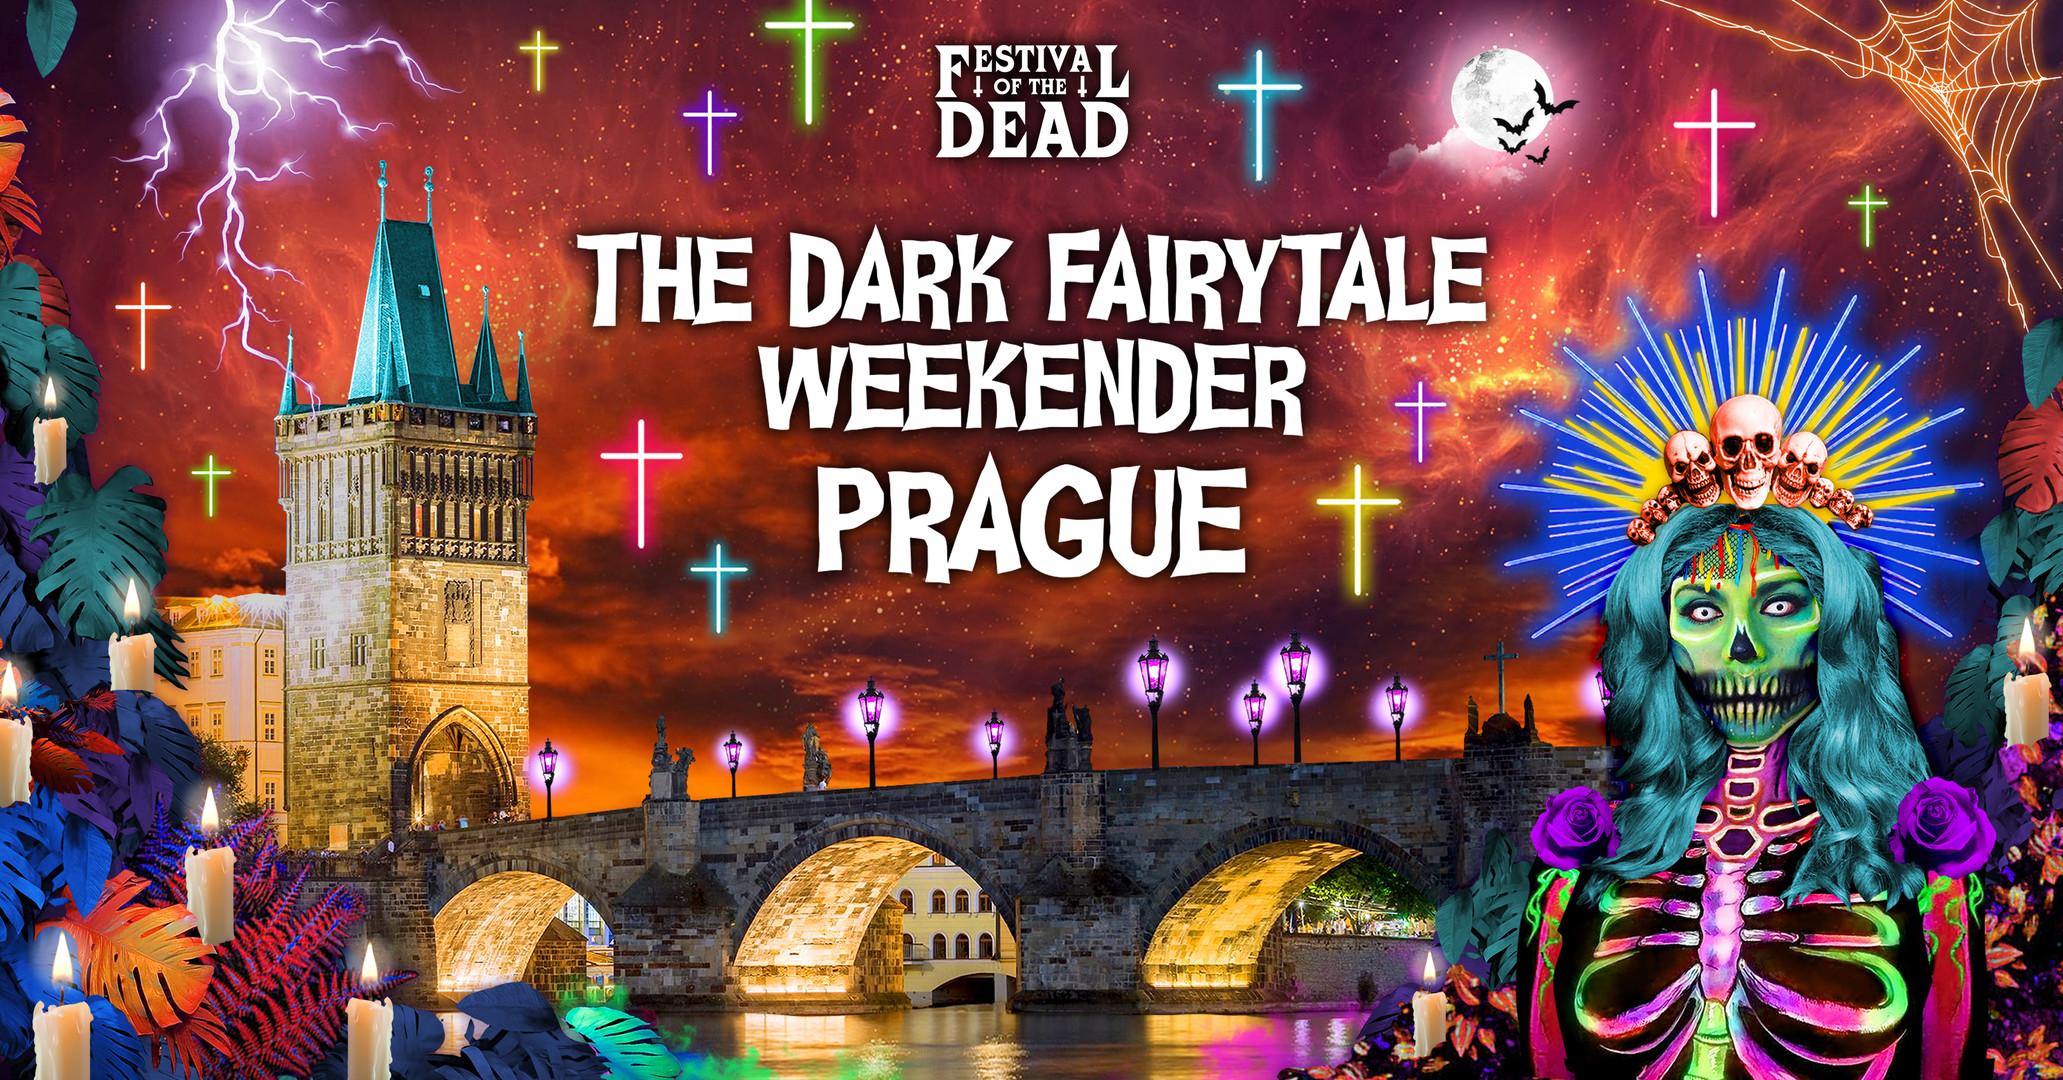 Festival Of The Dead Poster Design